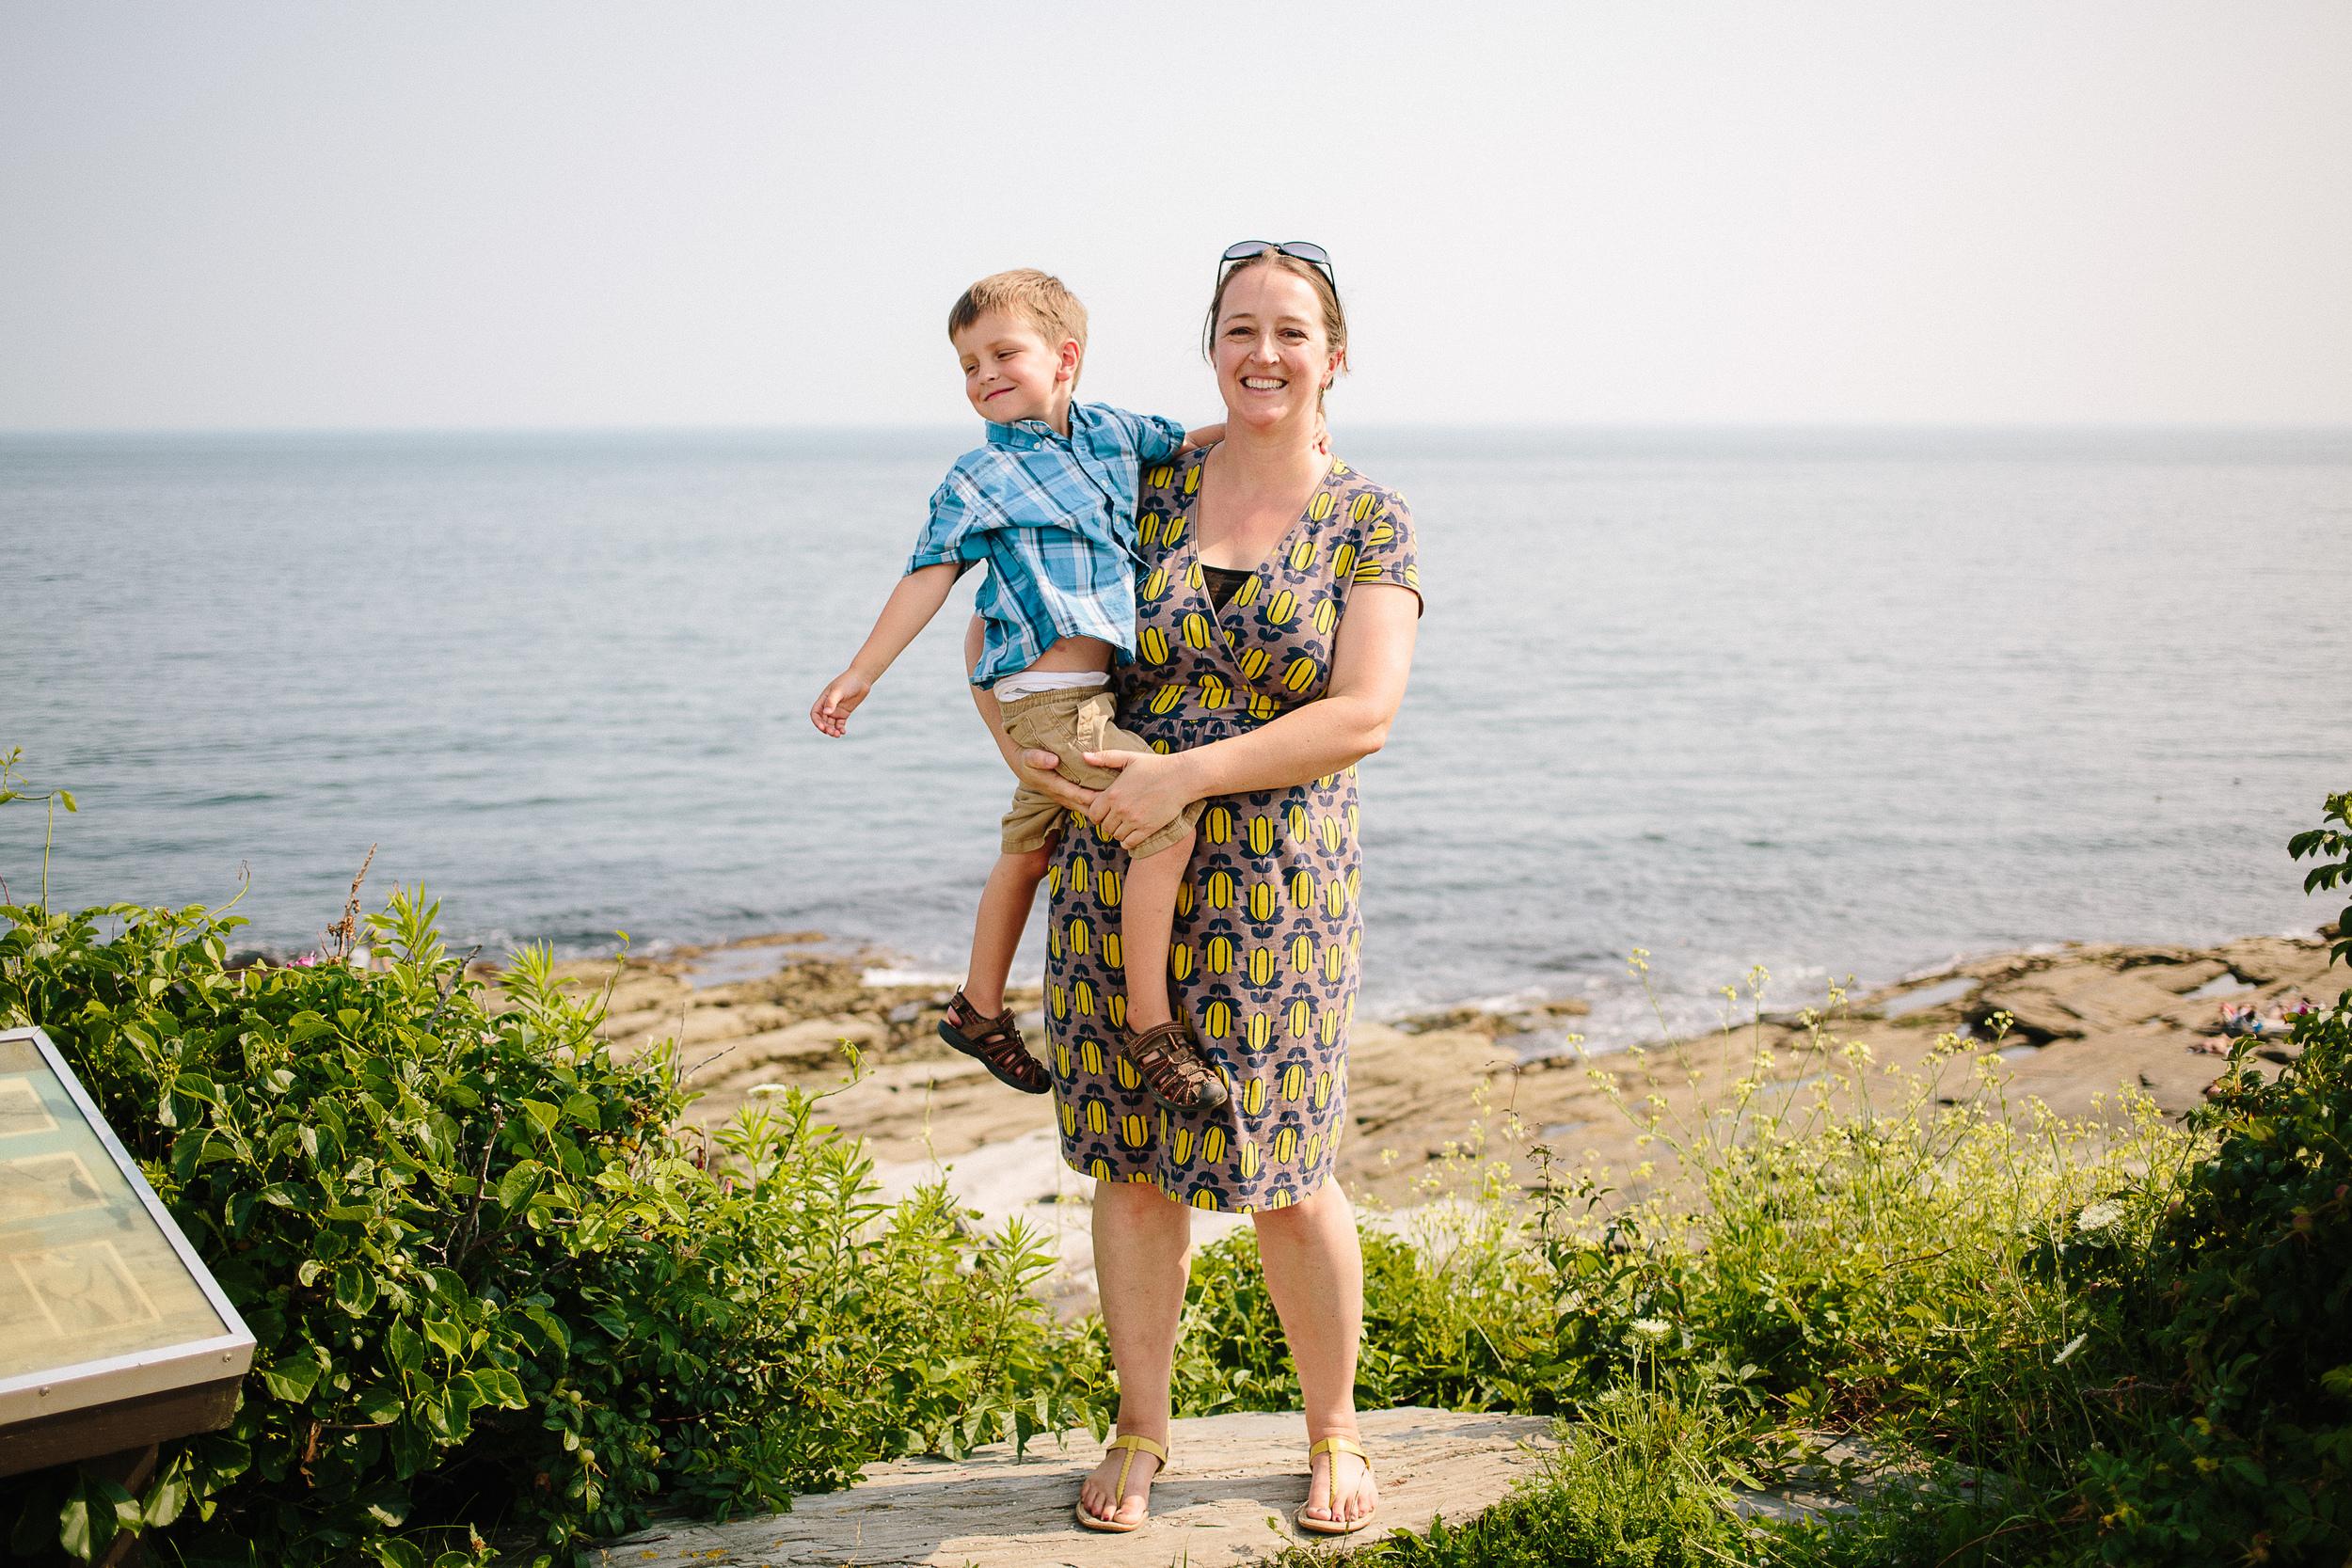 Amy&Demba_medprint_July2015_jenniferleahyphotography-051.jpg